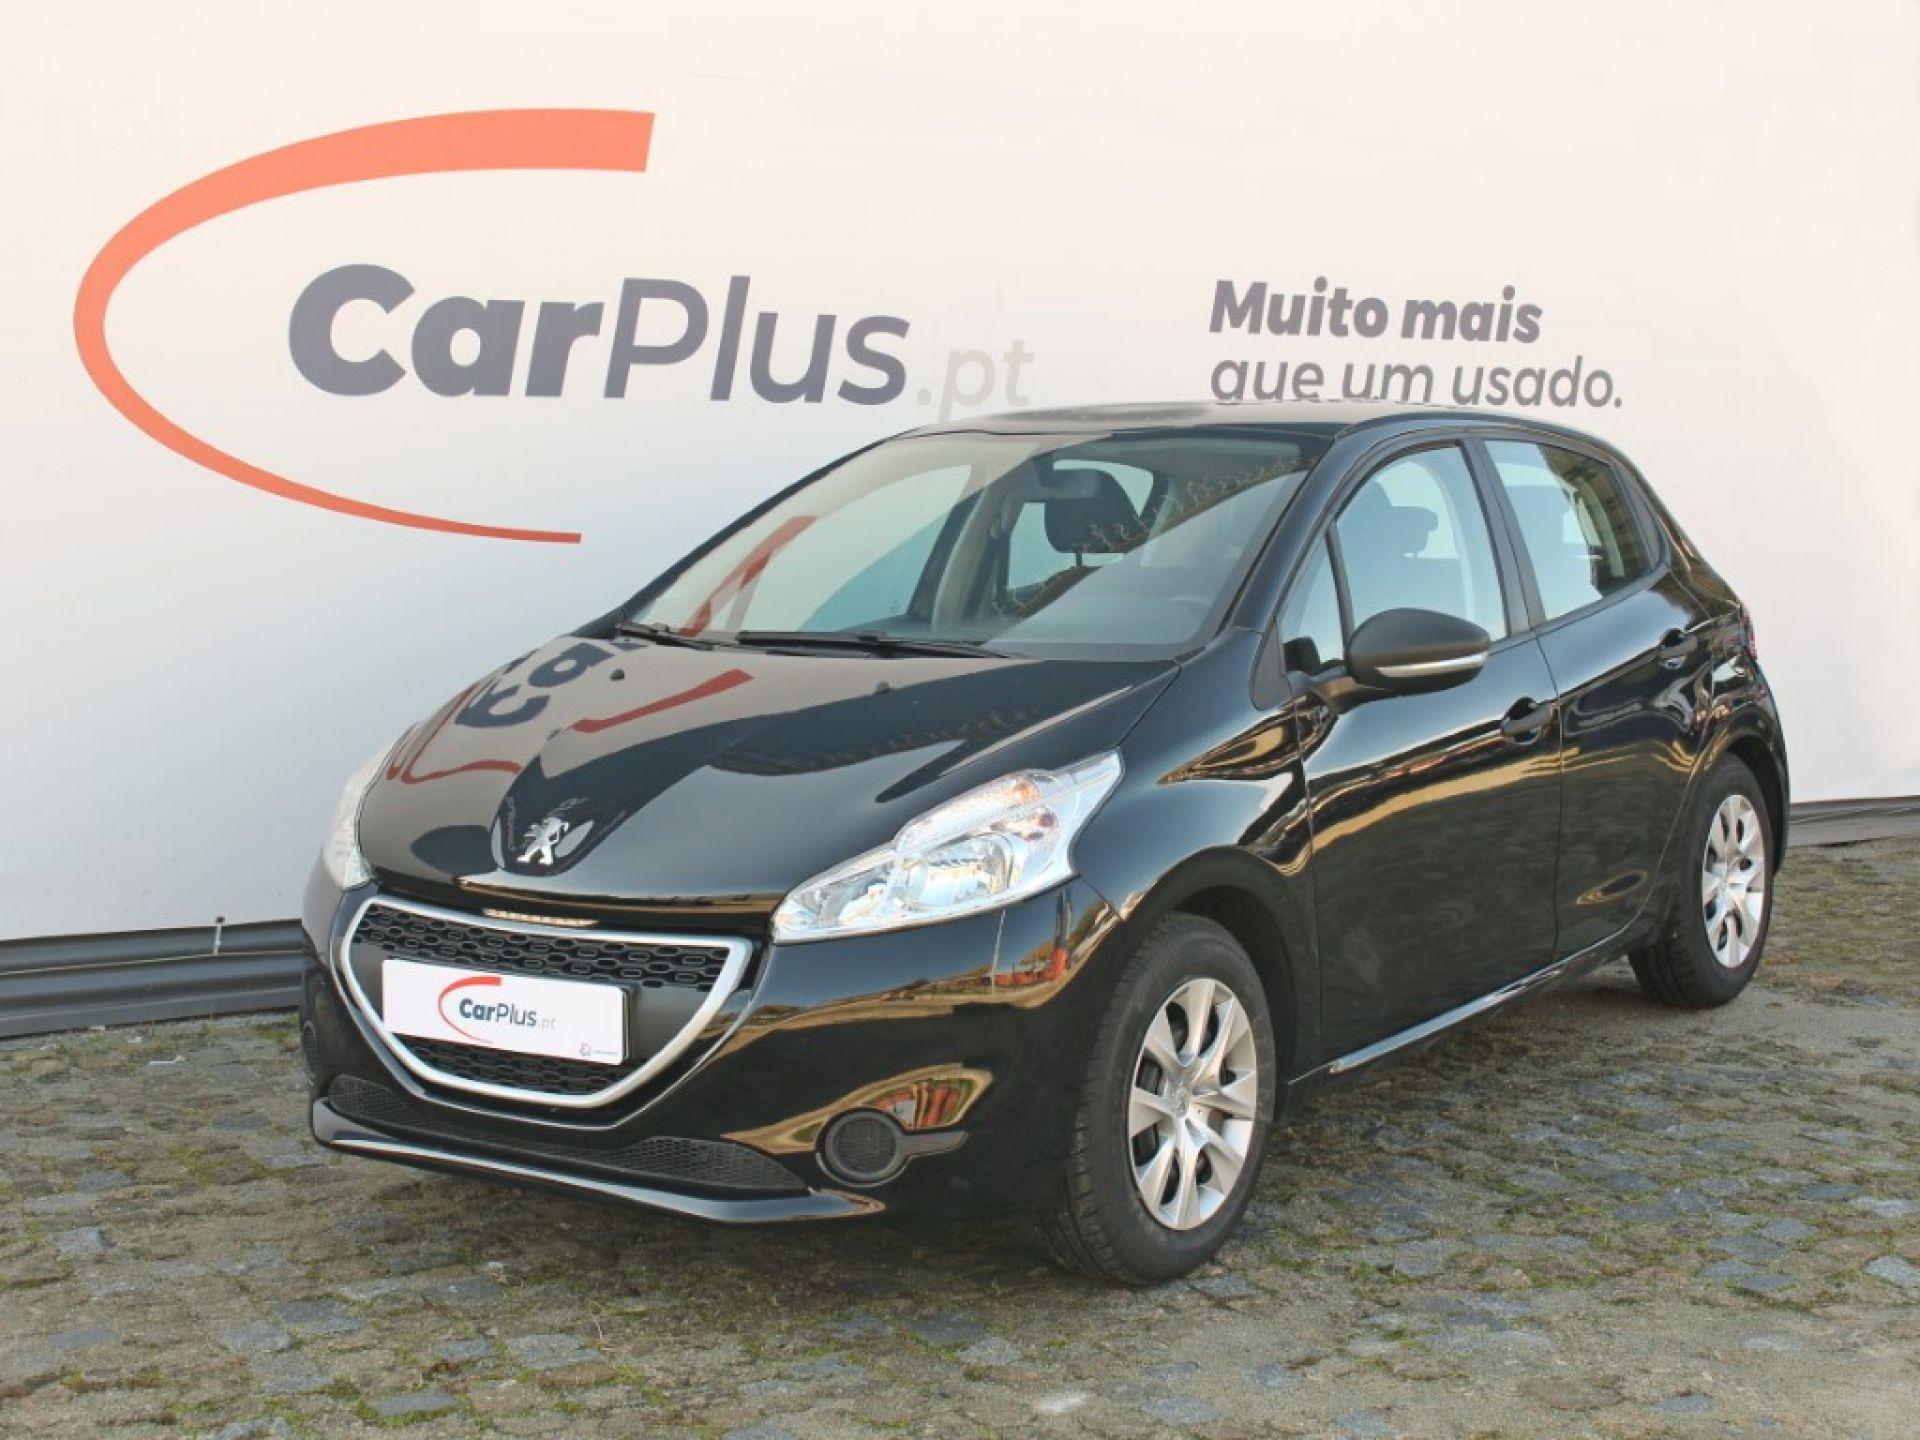 Peugeot 208 Access 1.0 VTi 68 CVM5 segunda mão Porto